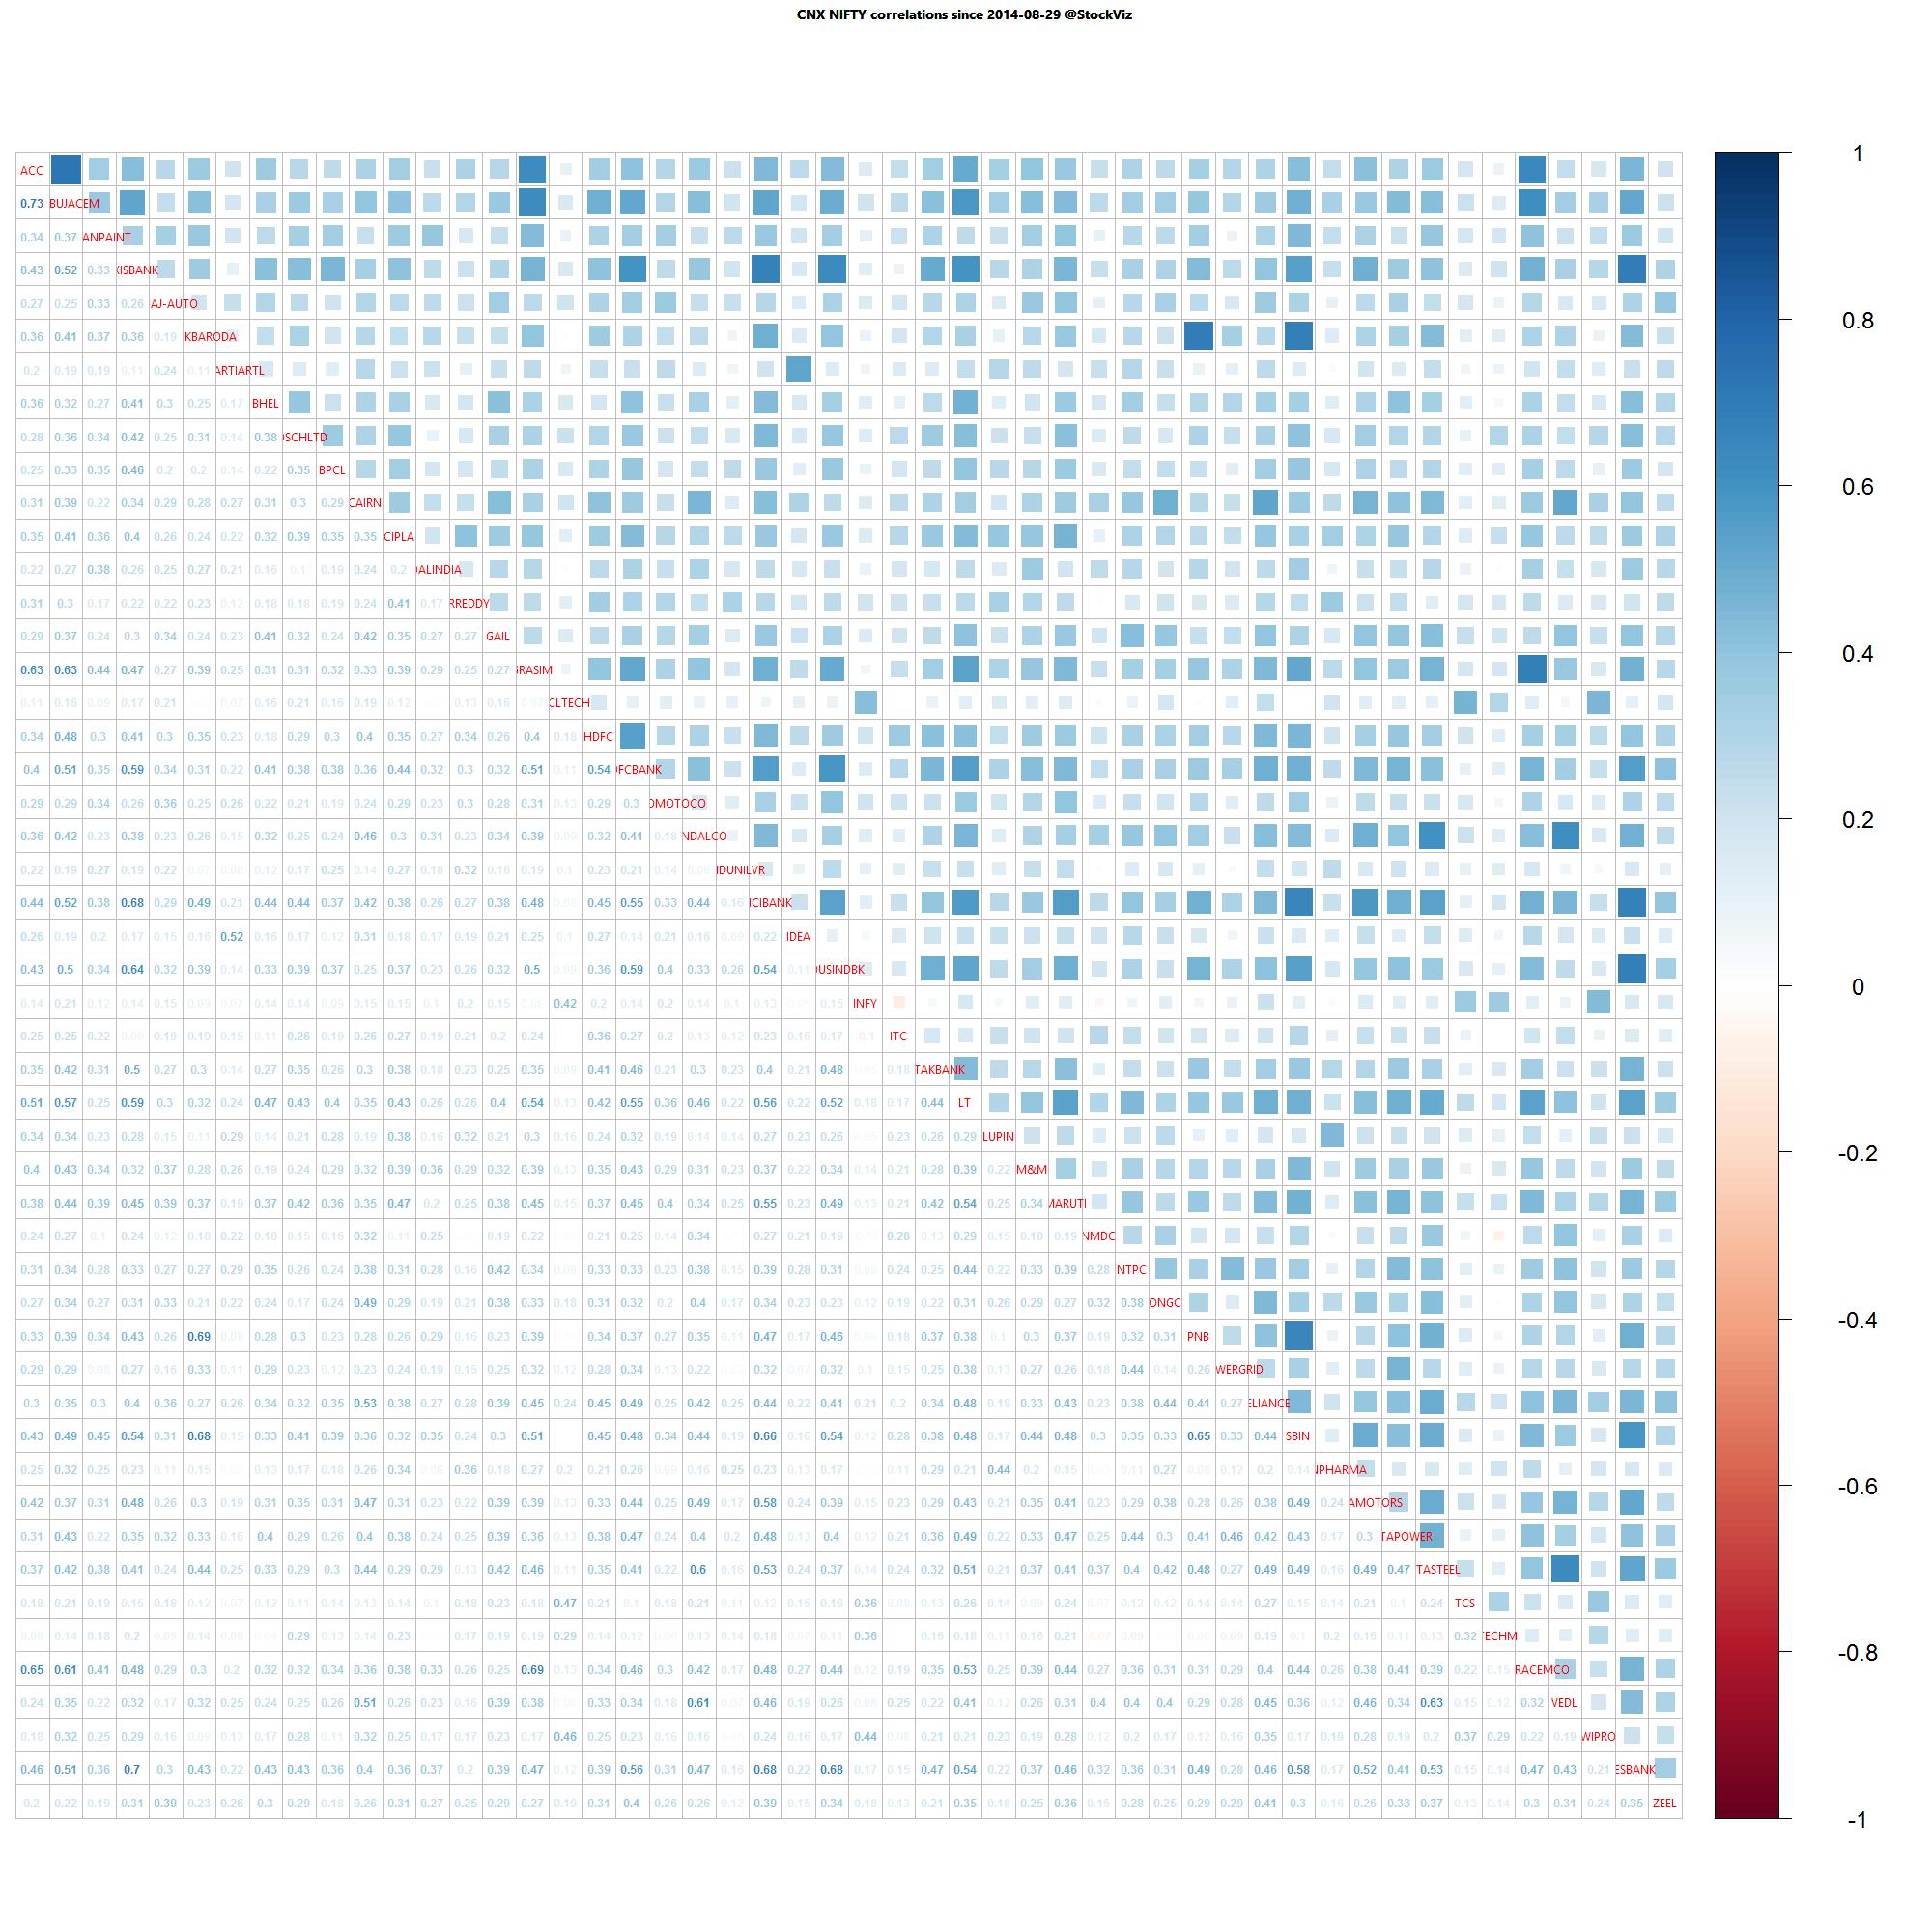 Nifty one year daily return correlations